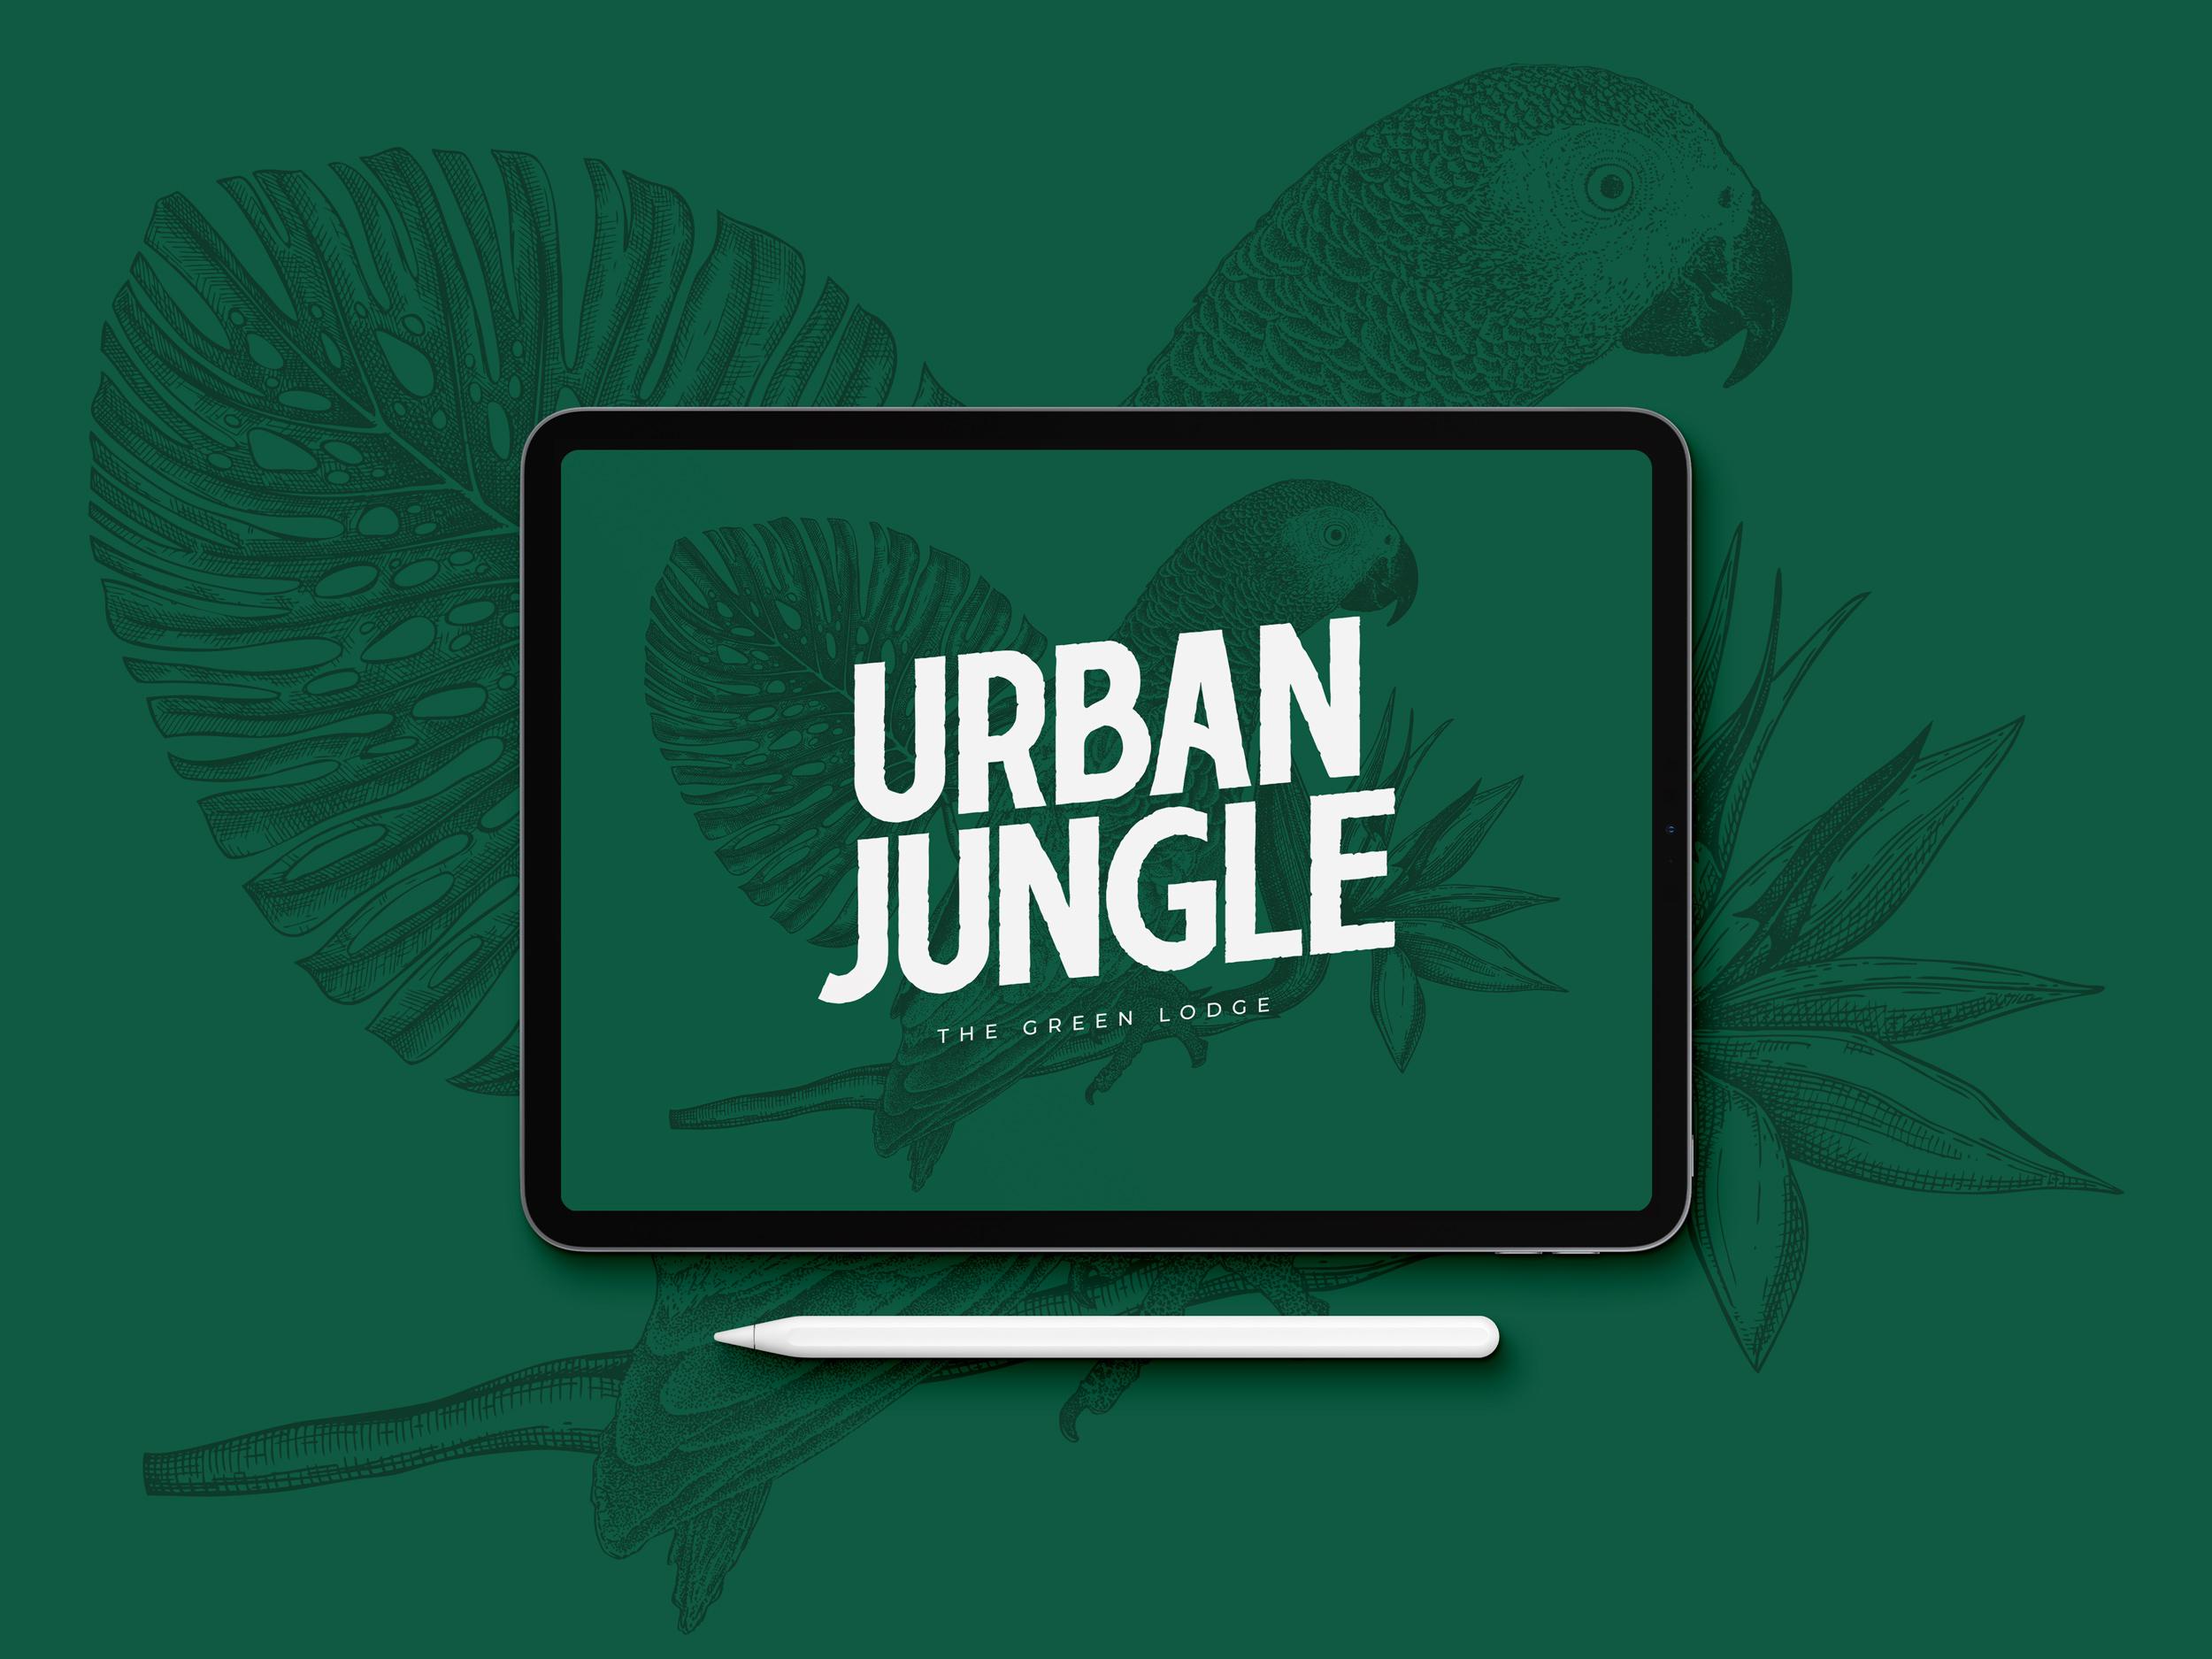 Urban Jungle Minimalist Hotel Branding by Buckwild